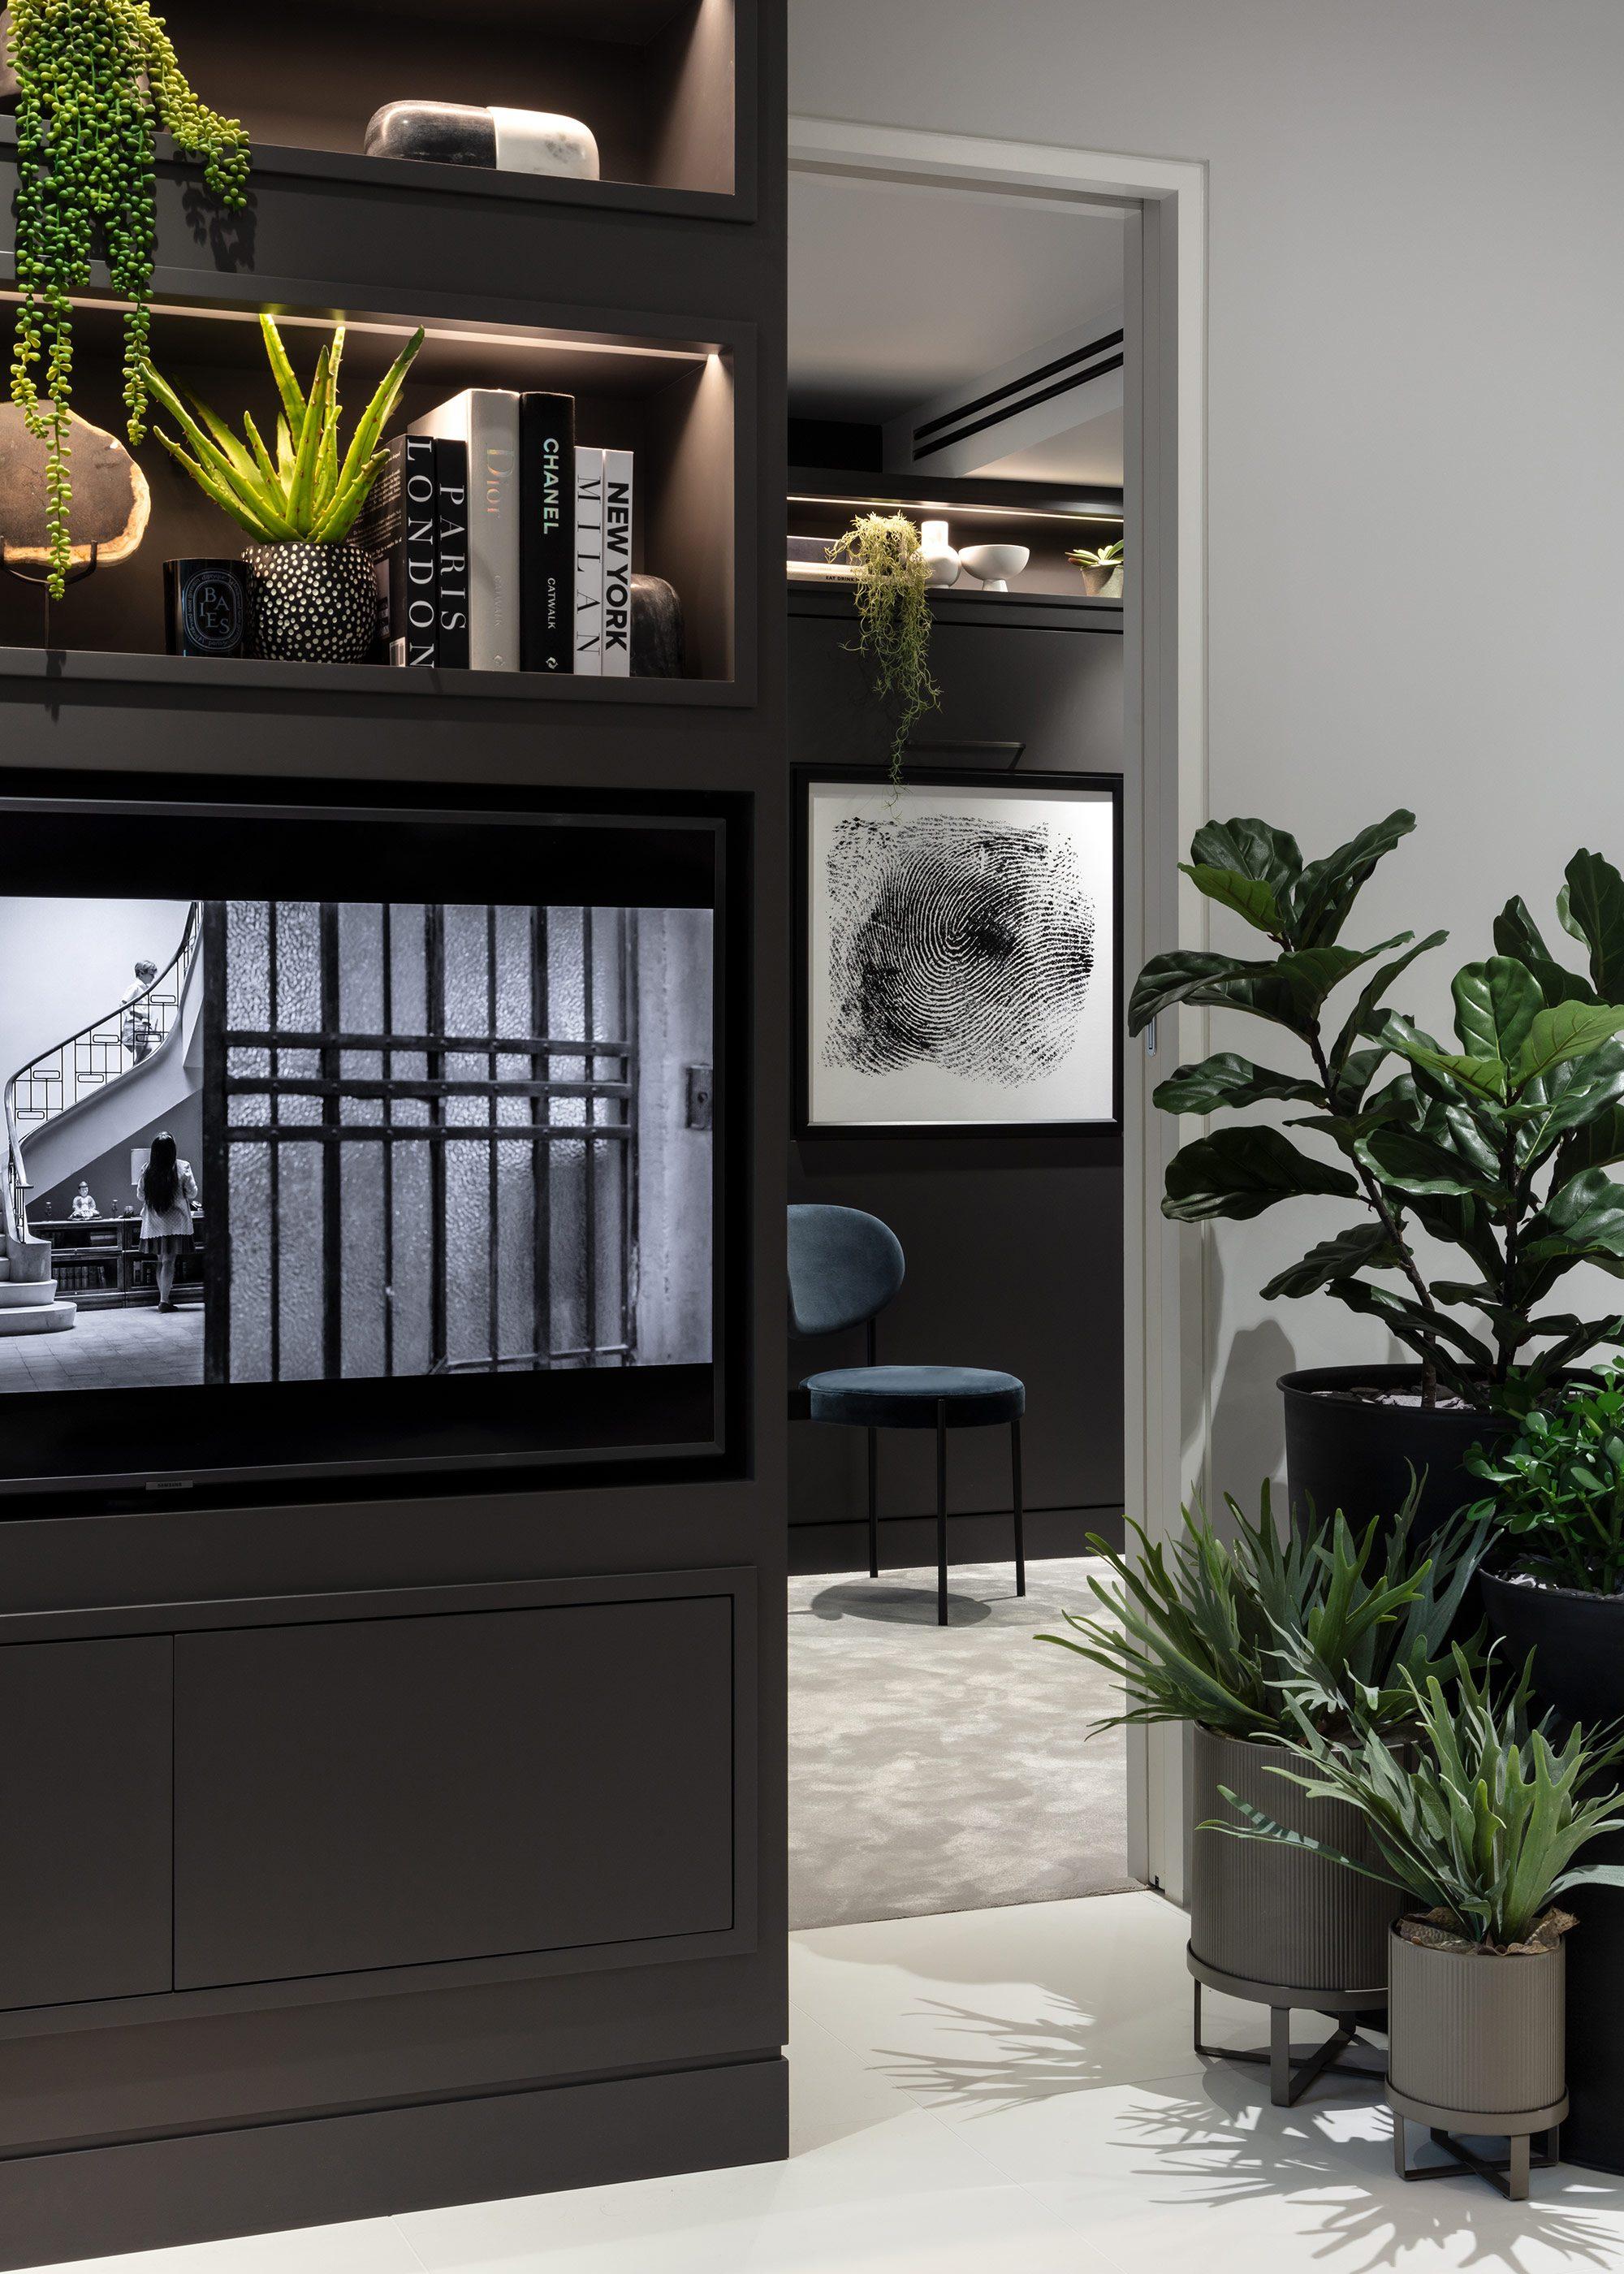 Honky Interior Design Luxury Apartment Hackney Road Living Room Detail 1b